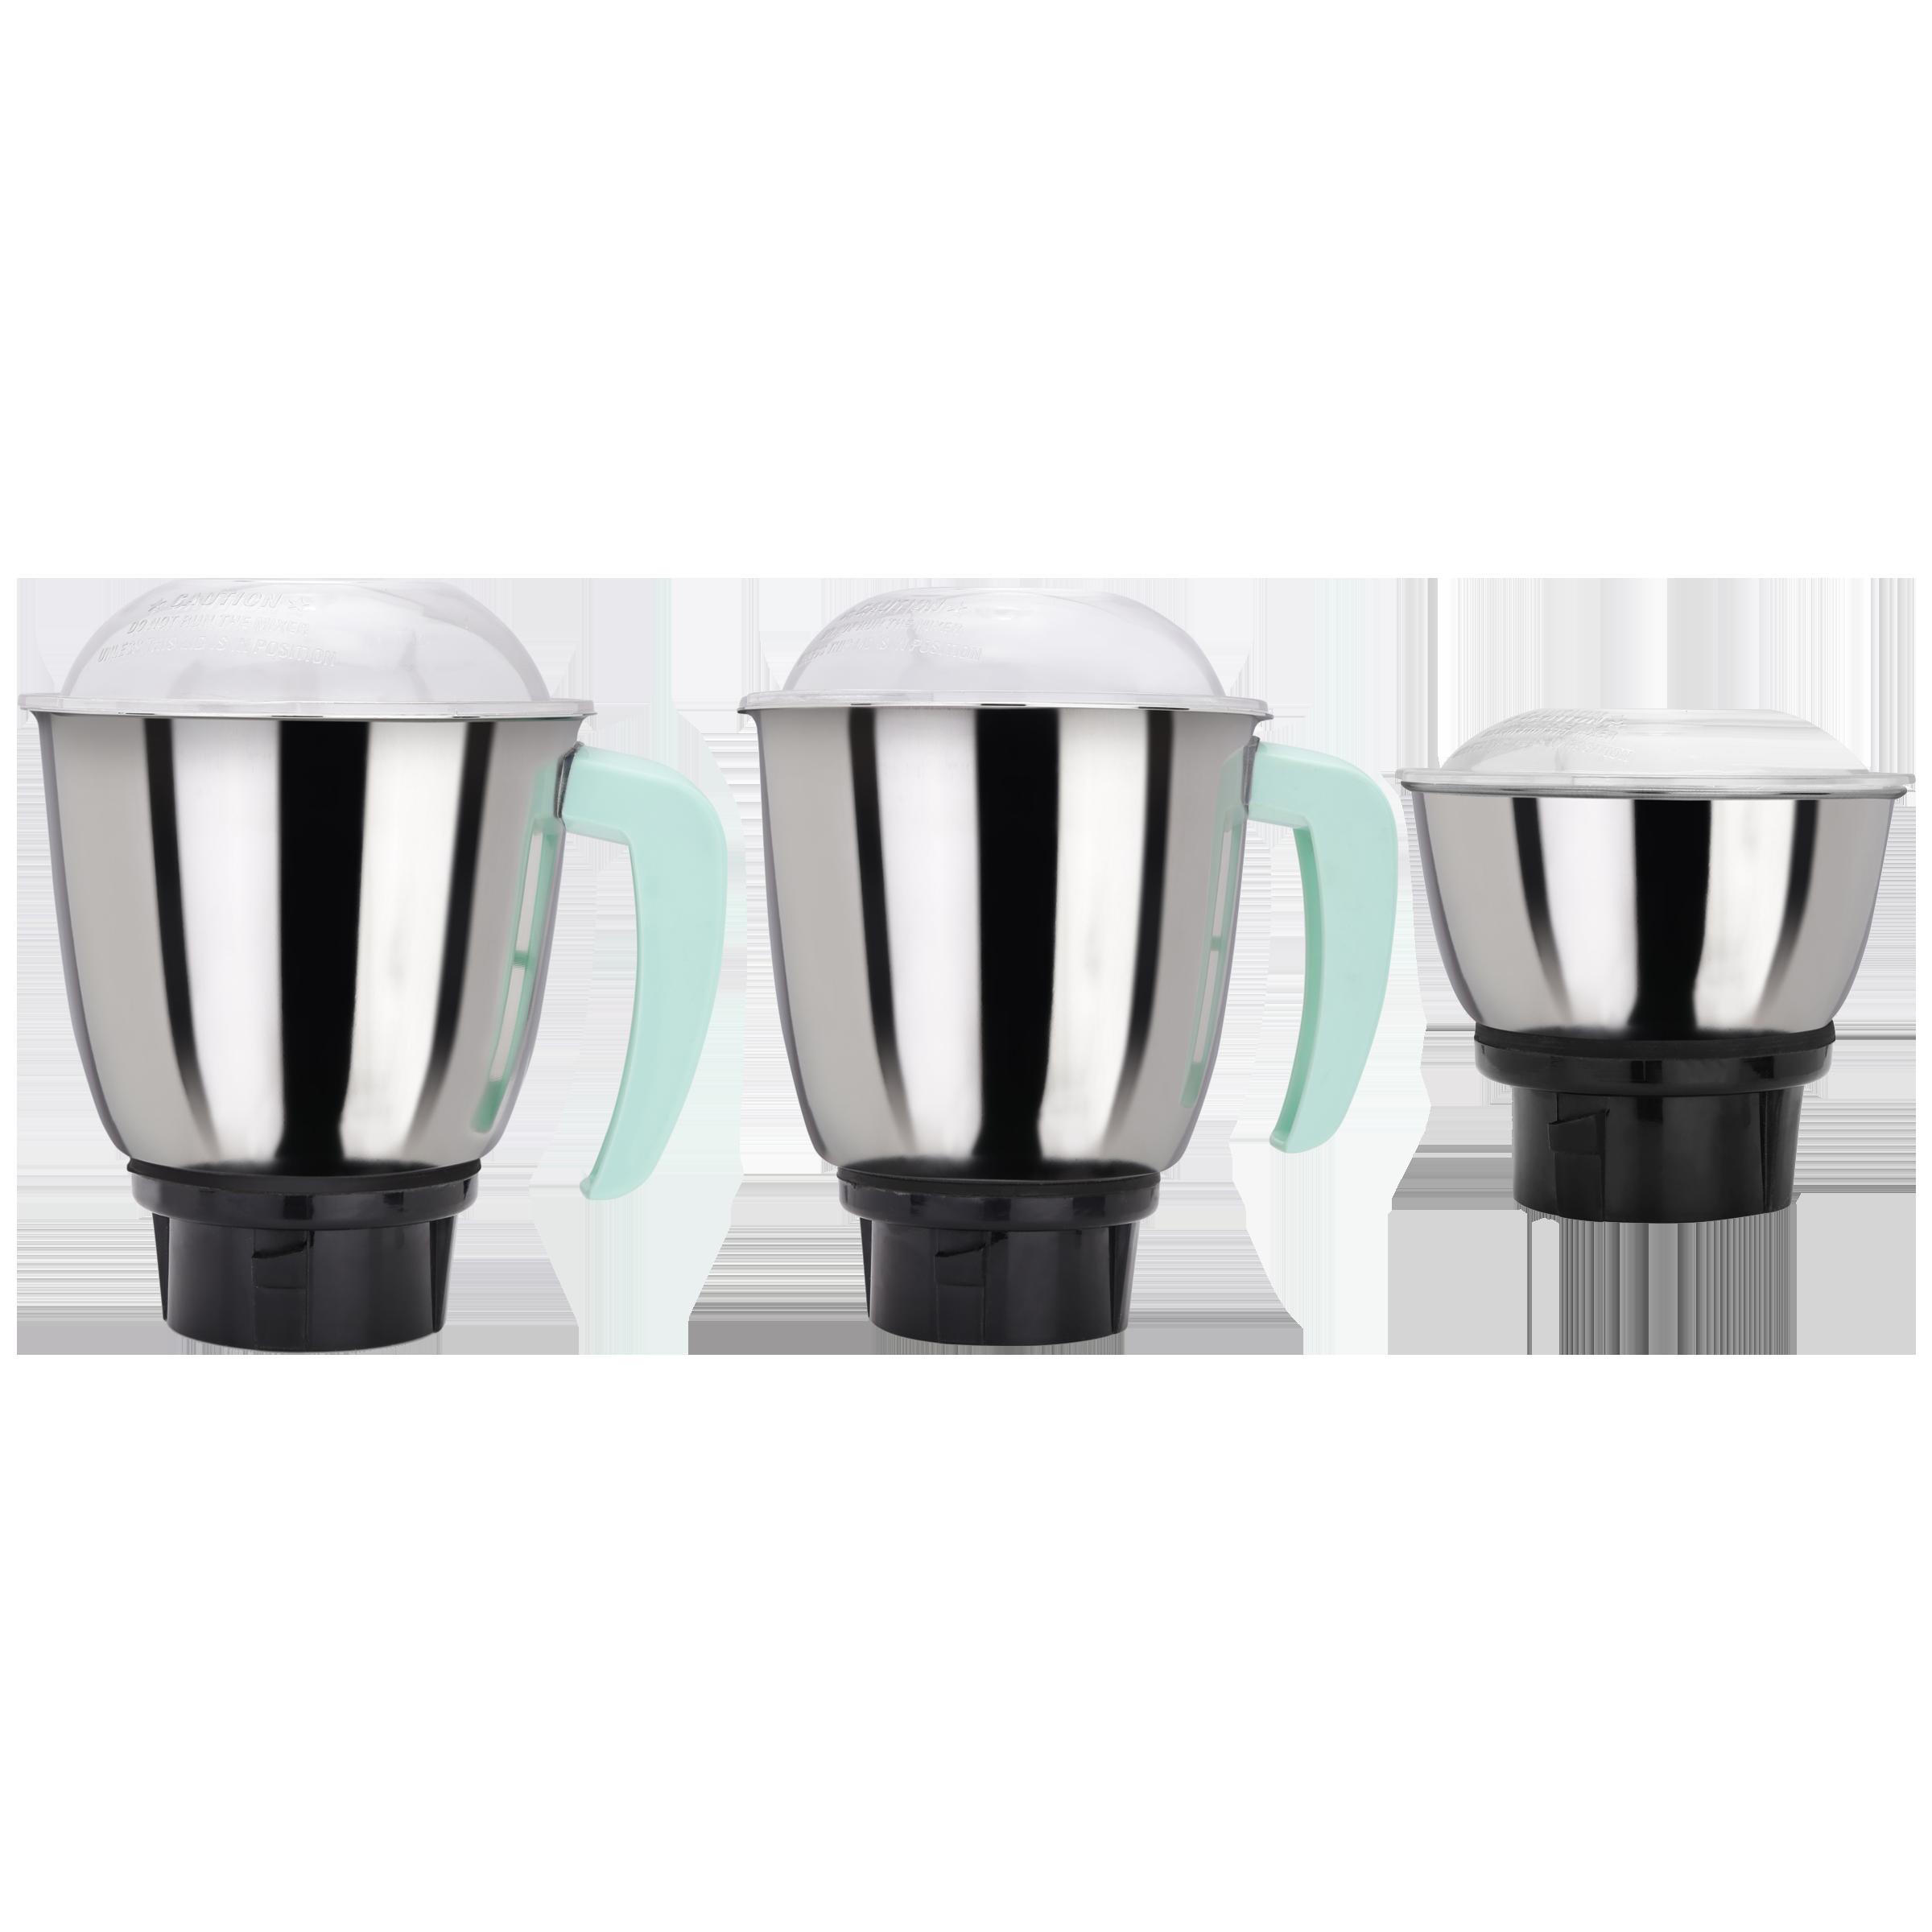 Croma Jars For Juicers Mixers Grinders (Accessories, CRAK4183, Silver)_1